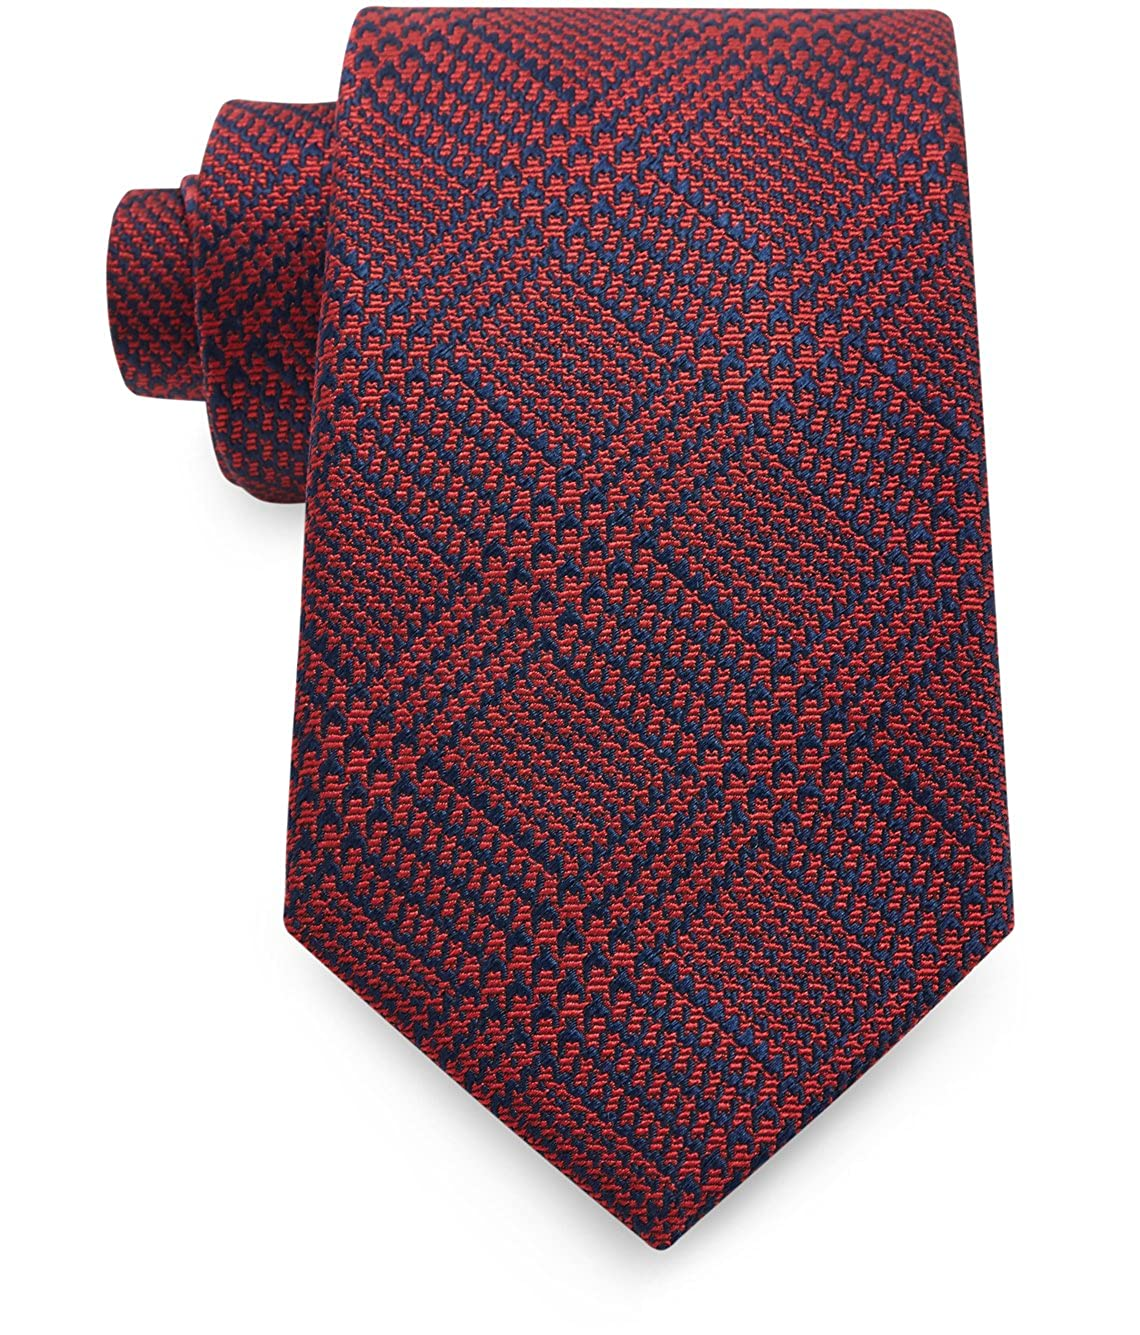 Austin Reed camiseta de ropa 8 cm Corbata de cuadros Príncipe de ...